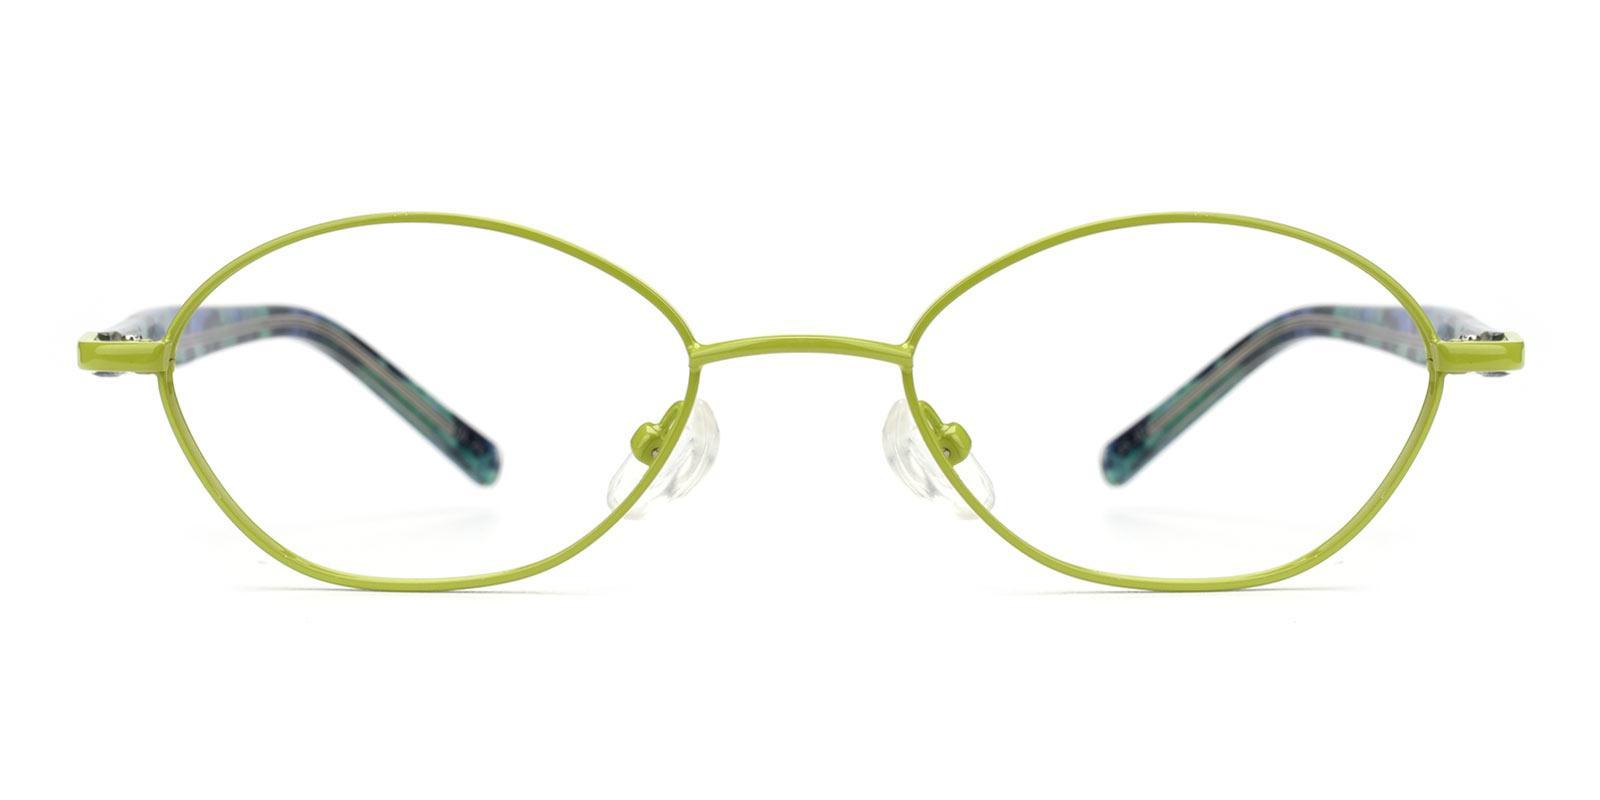 Lollipop-Green-Oval-Metal-Eyeglasses-detail